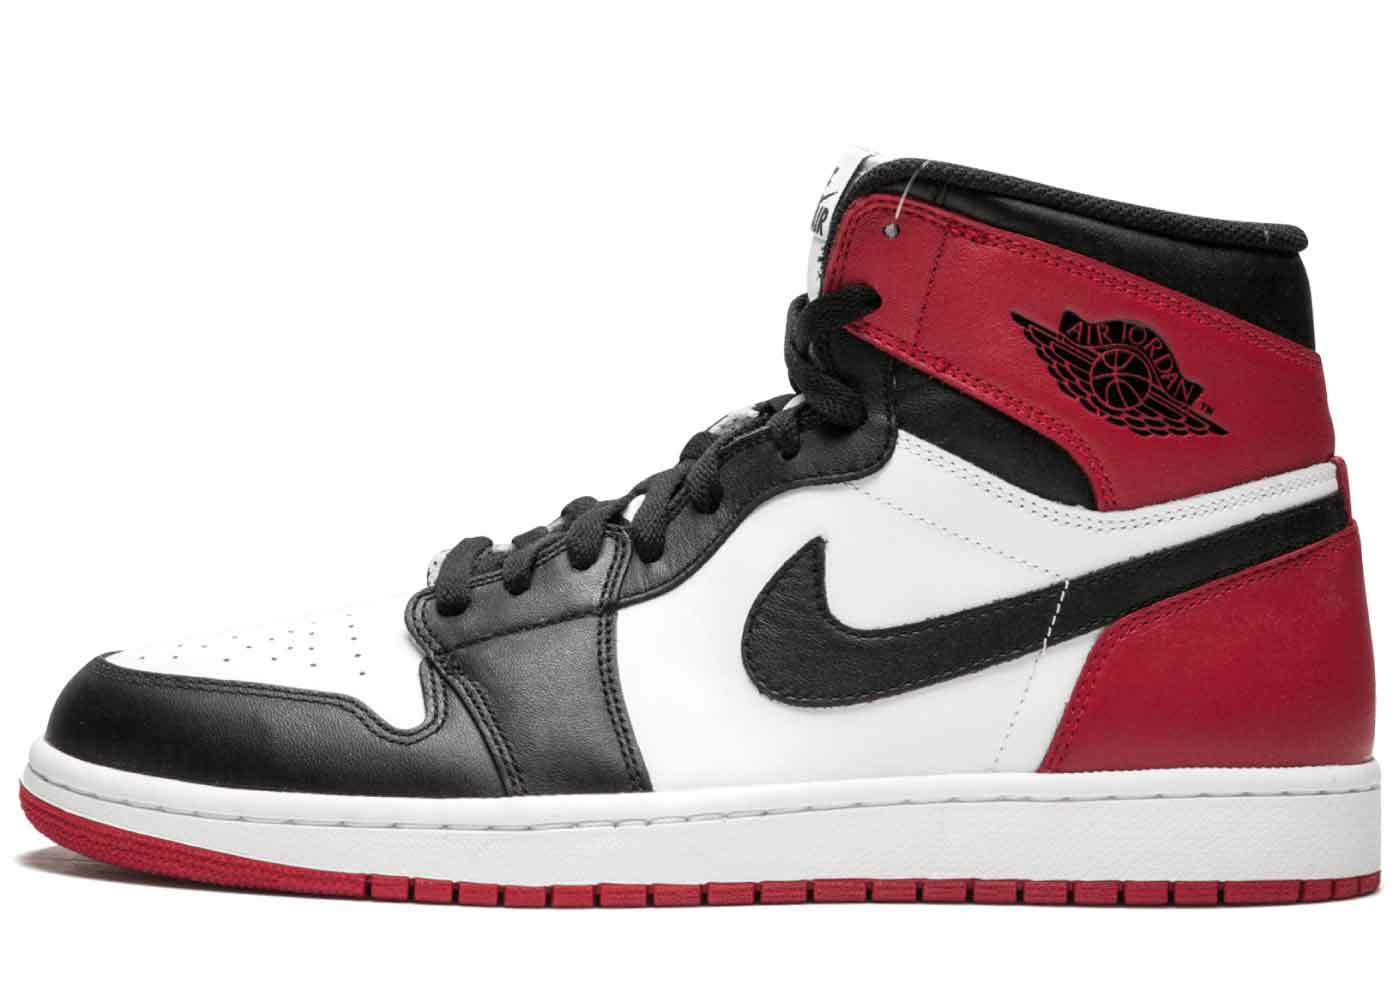 Nike Air Jordan 1 Retro Black Toe (2013)の写真